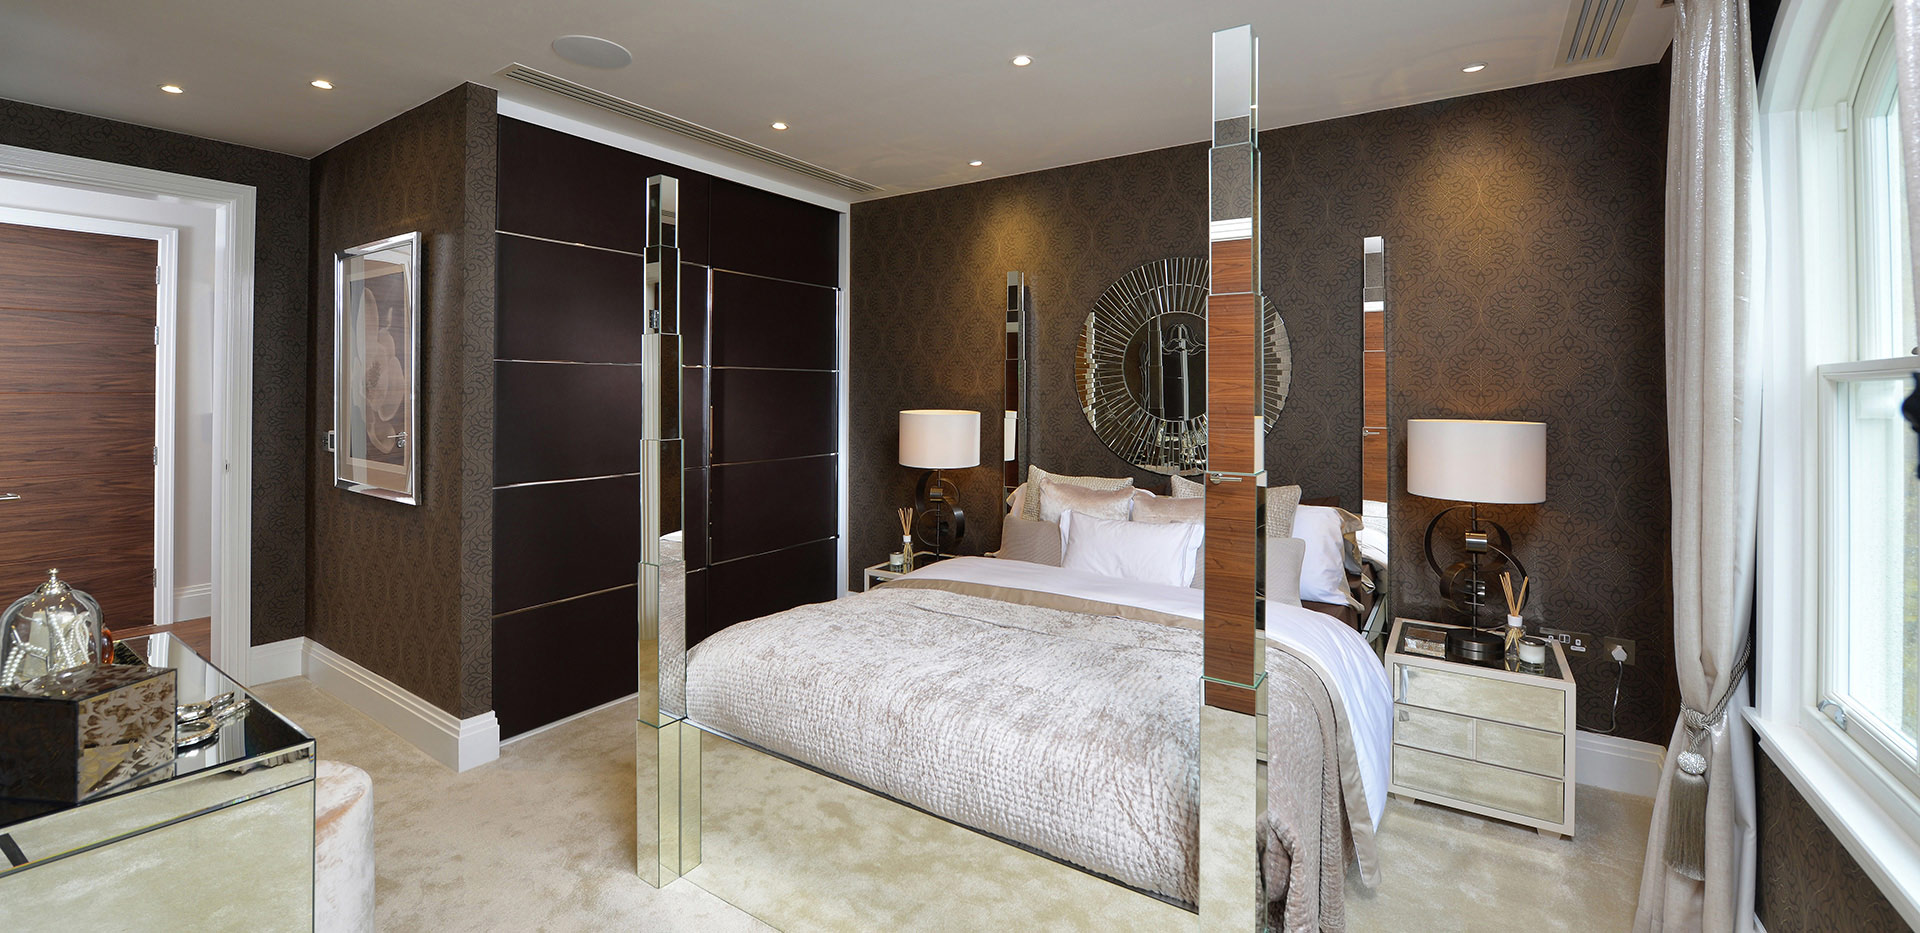 Berkeley, St Josephs Gate, Show Apartment, Master Bedroom, Interior